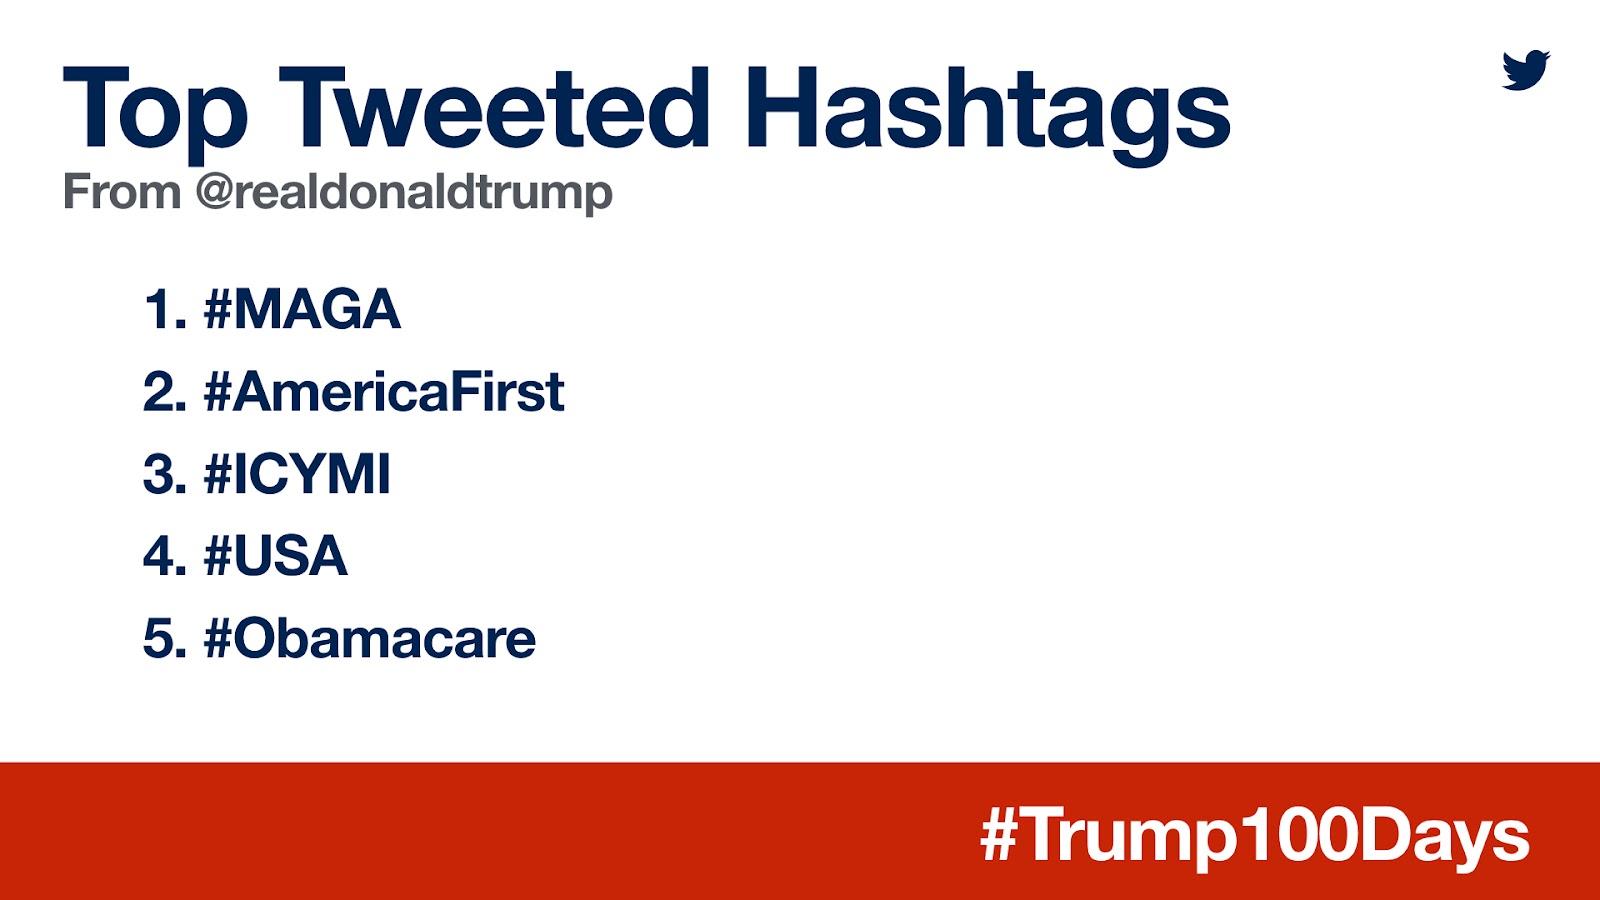 Trump Graphic 1 Hashtags (3).jpeg